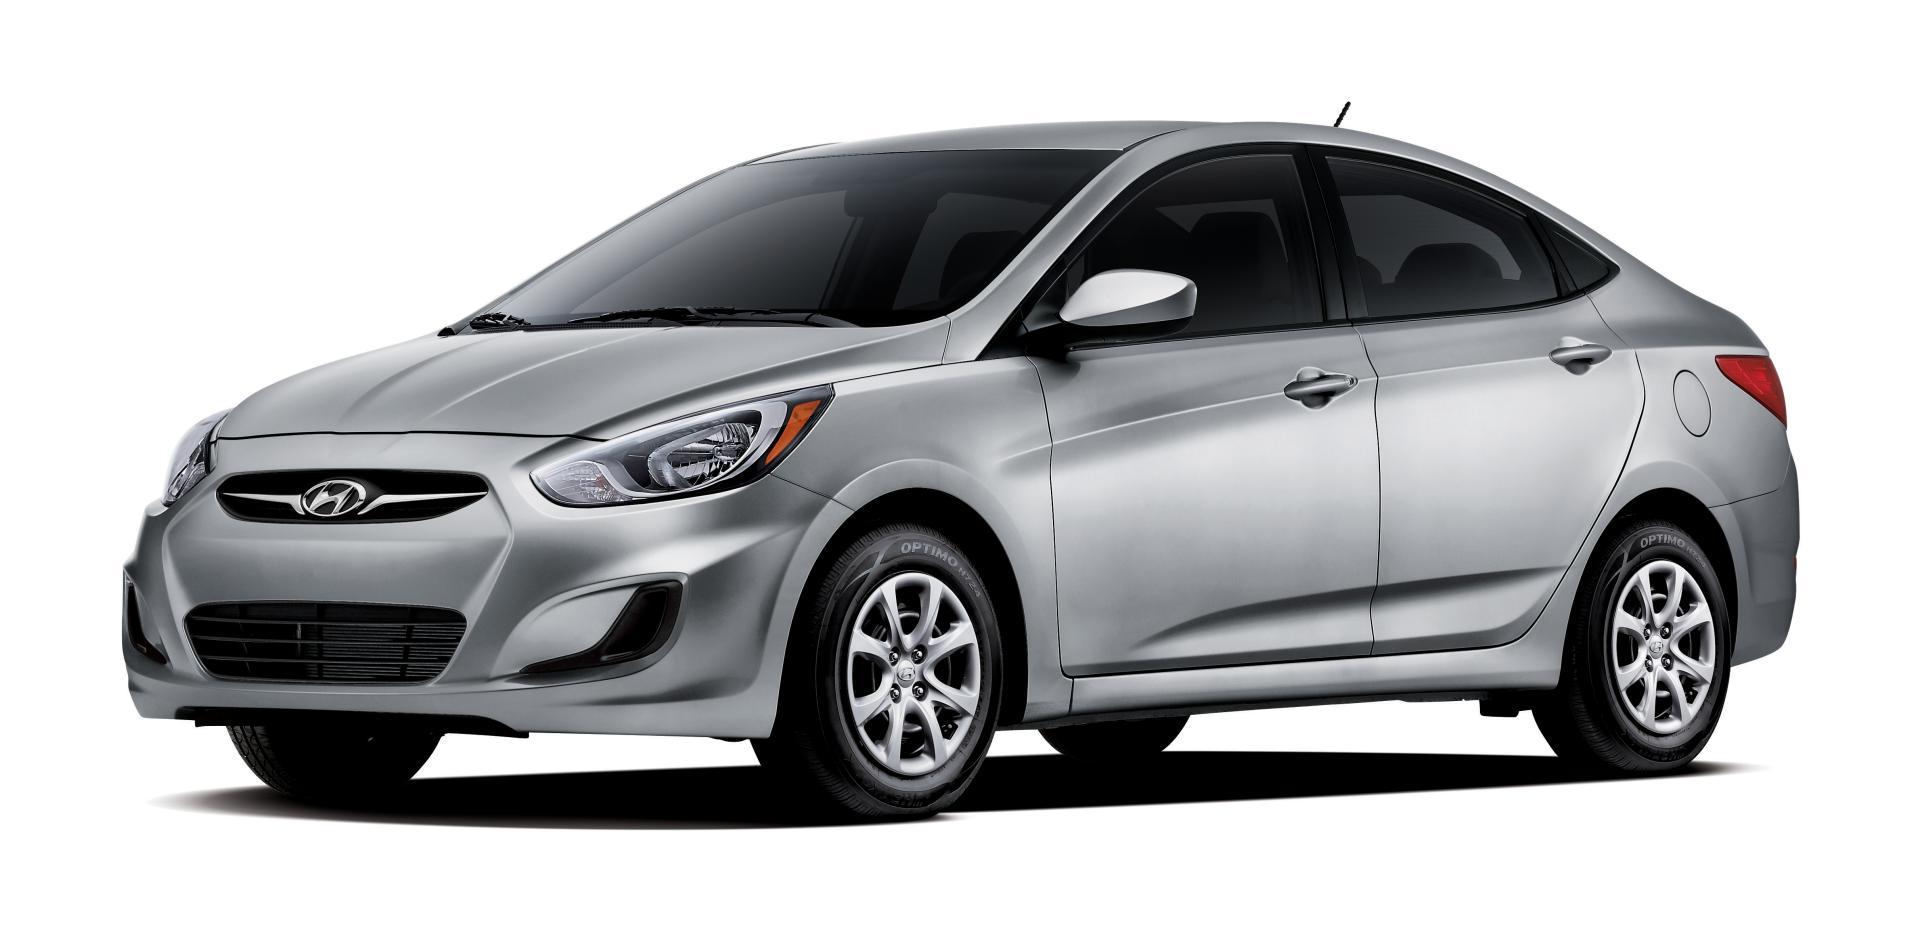 2014 Hyundai Accent - conceptcarz.com